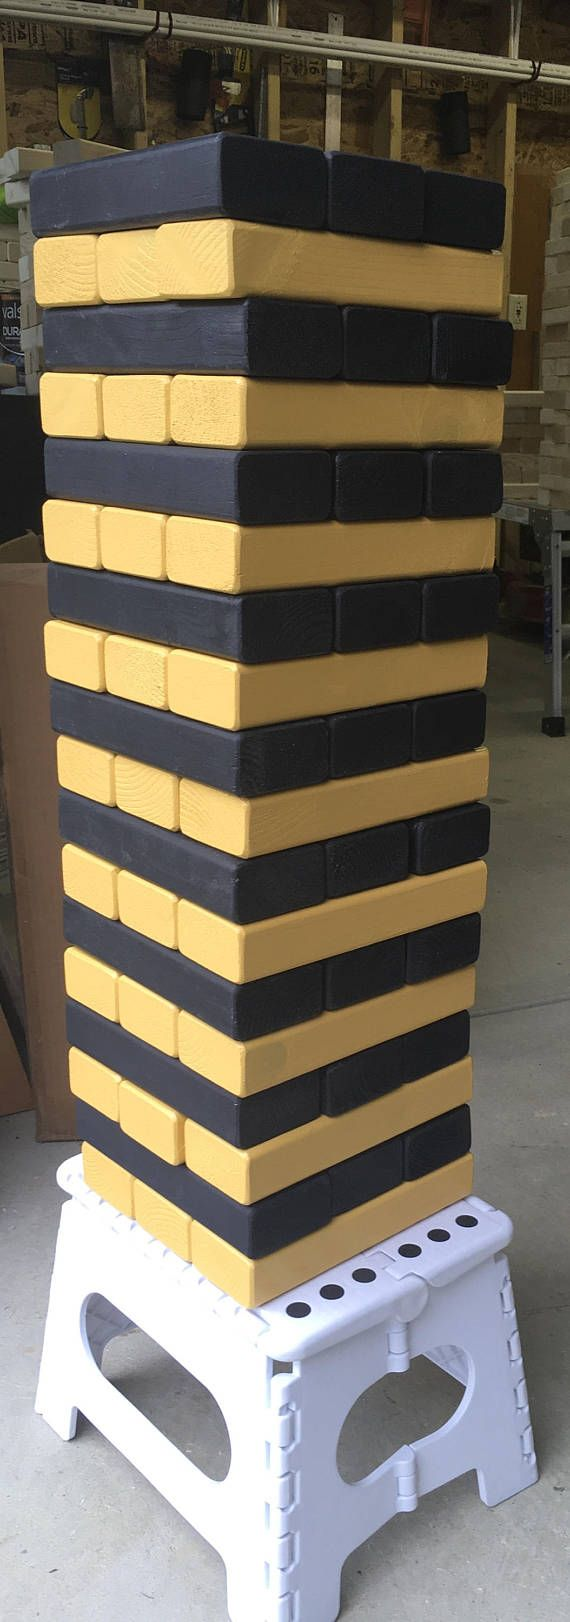 Jumbo wood blocks  GameBlack and Gold Jenga  Pittsburgh